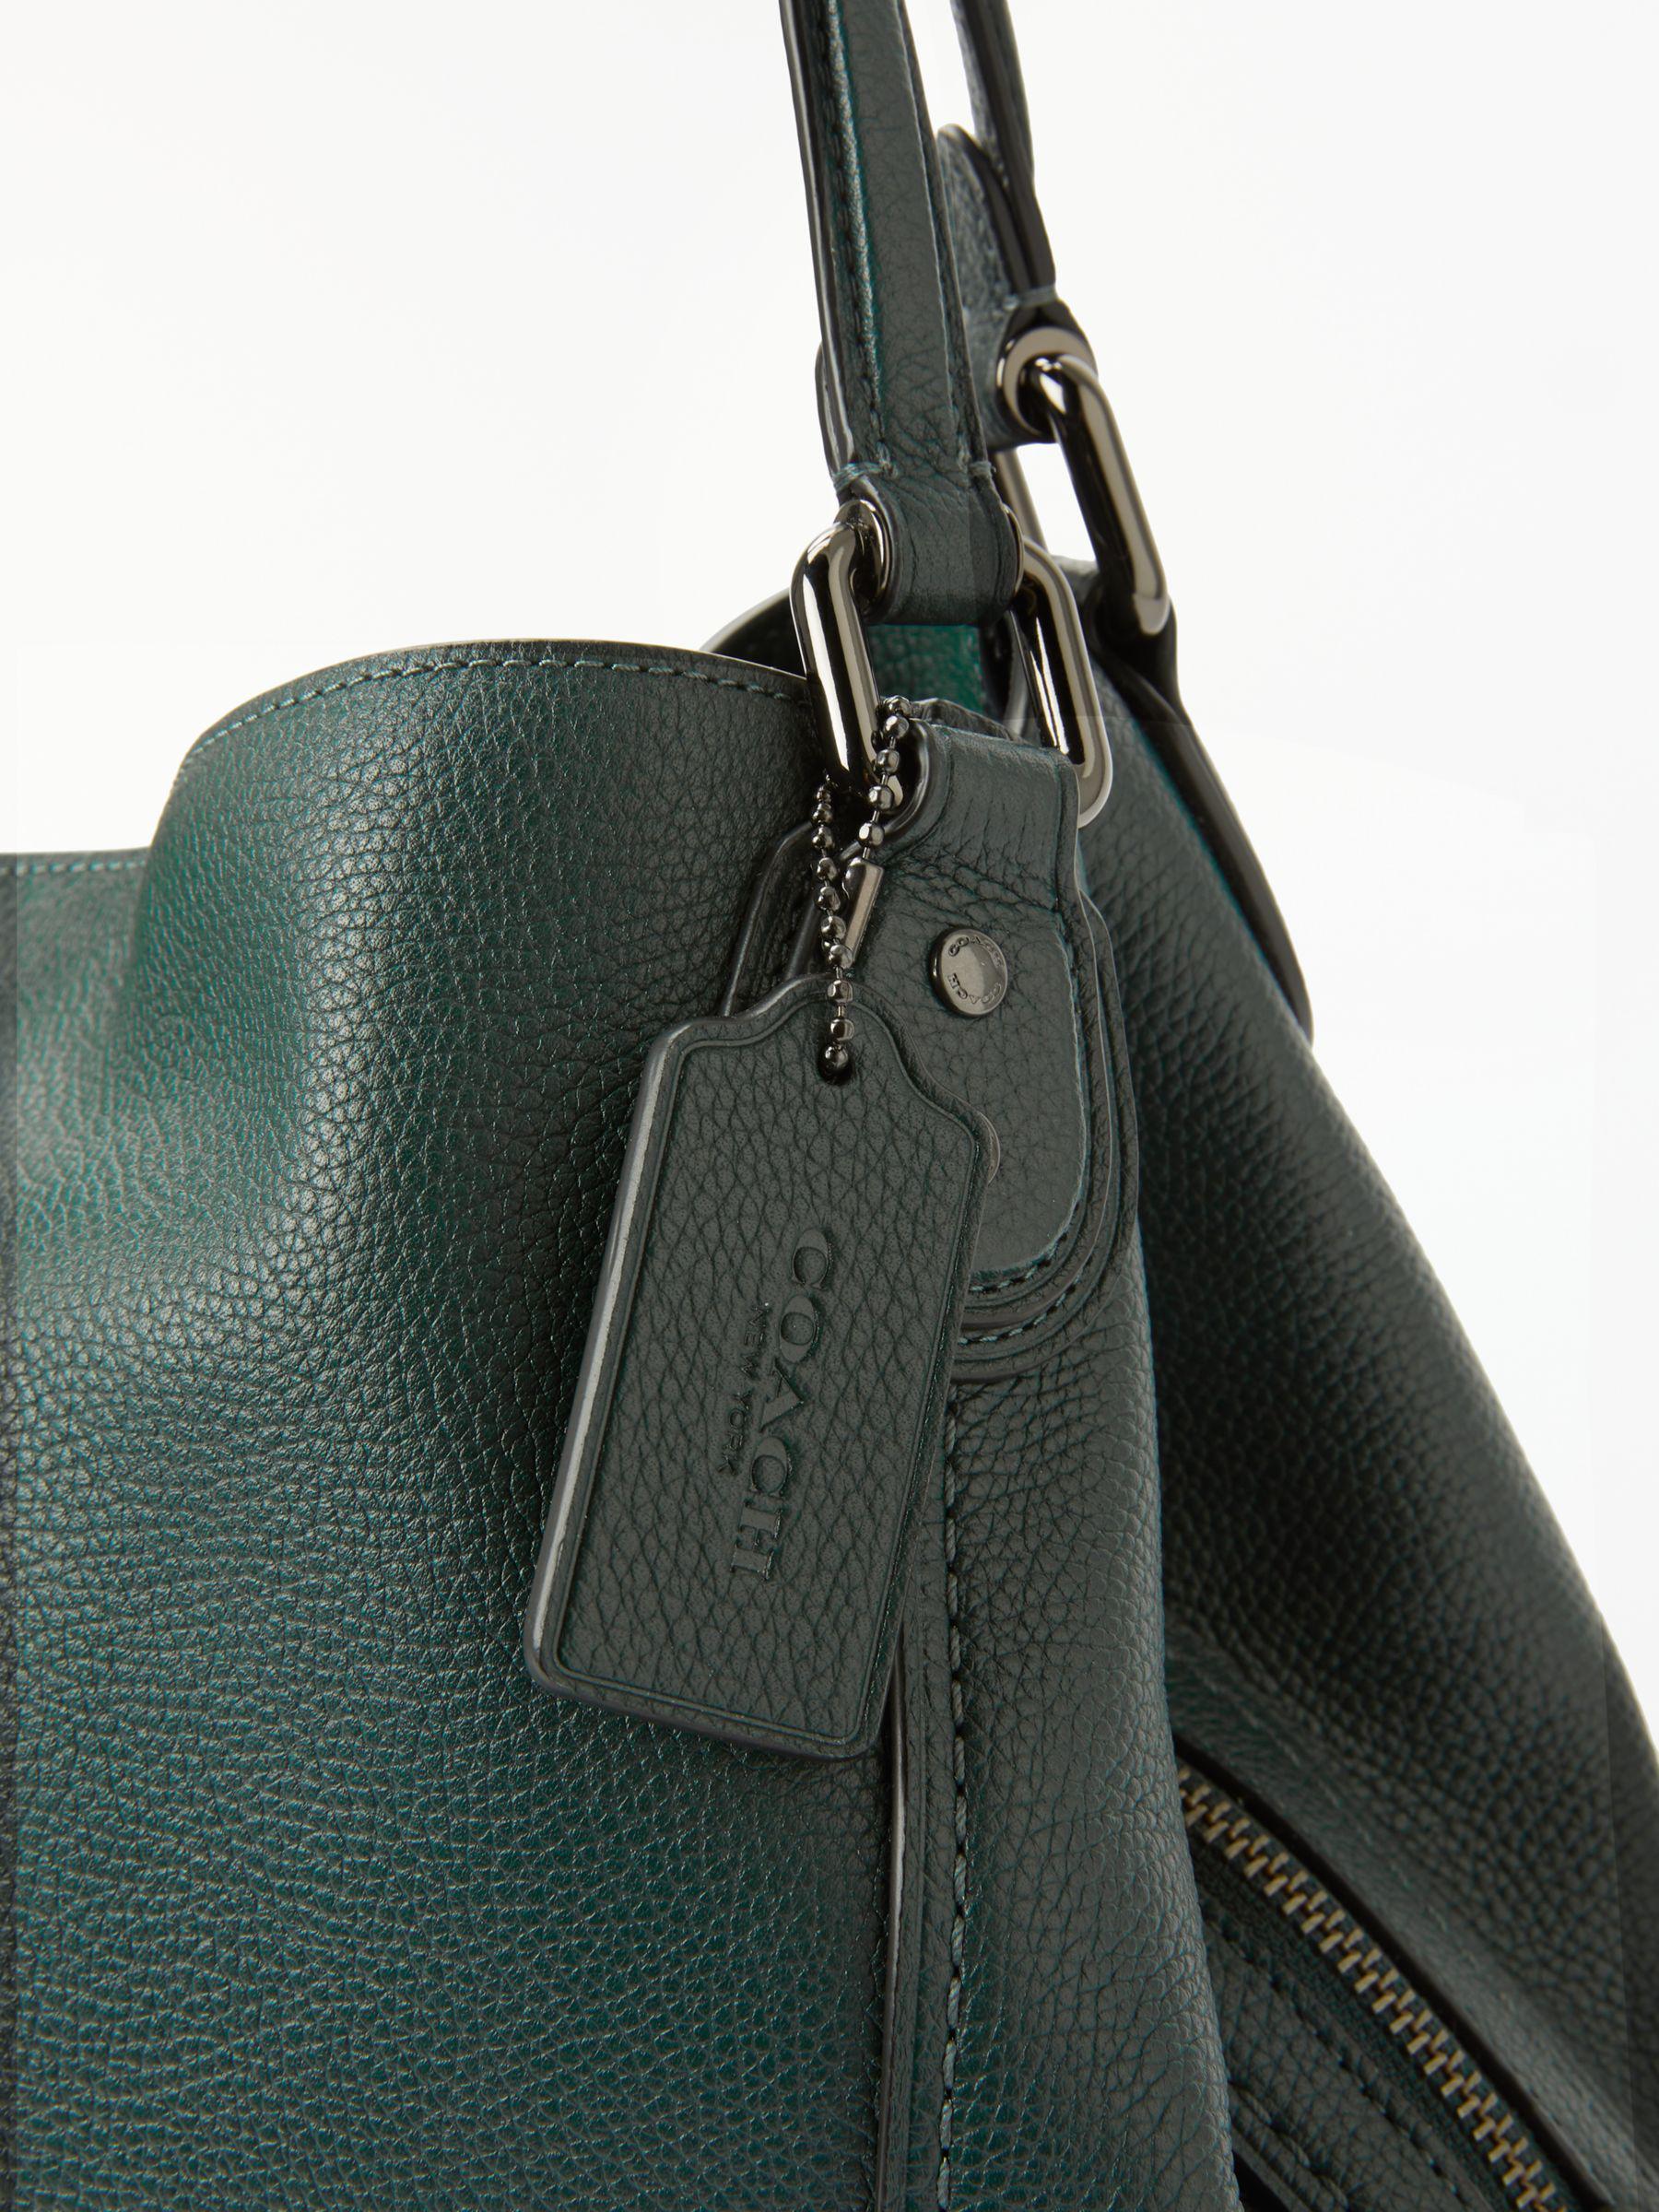 edc6c6e5ed7b68 coach-Cypress-Edie-31-Polished-Pebble-Leather-Shoulder-Bag.jpeg